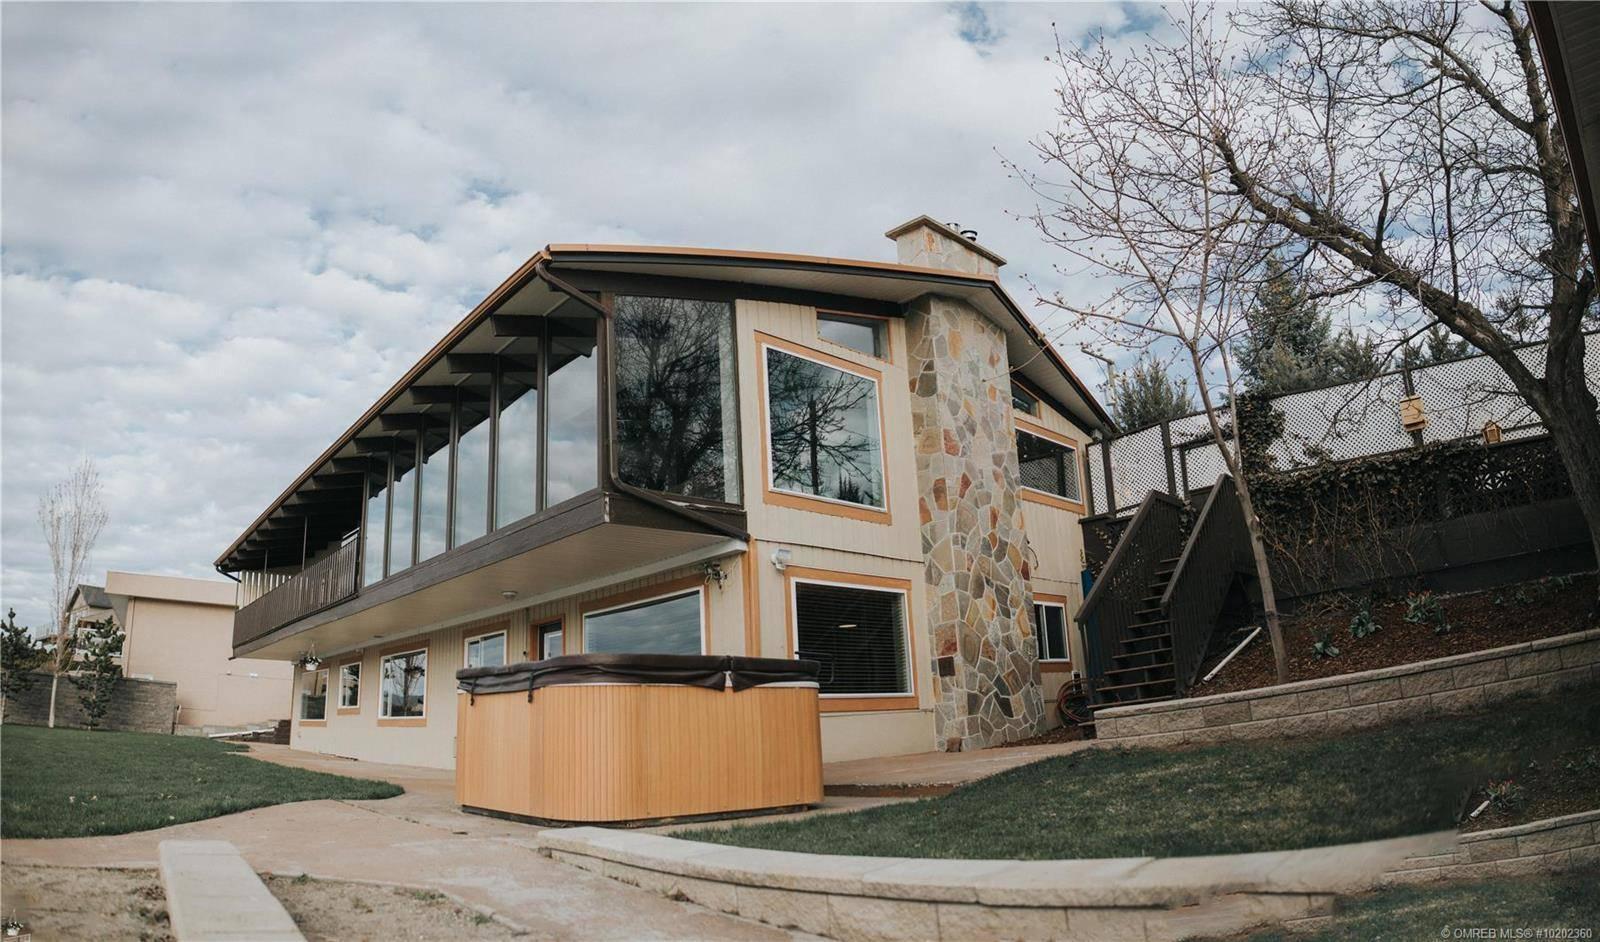 House for sale at 7975 Okanagan Landing Rd Vernon British Columbia - MLS: 10202360